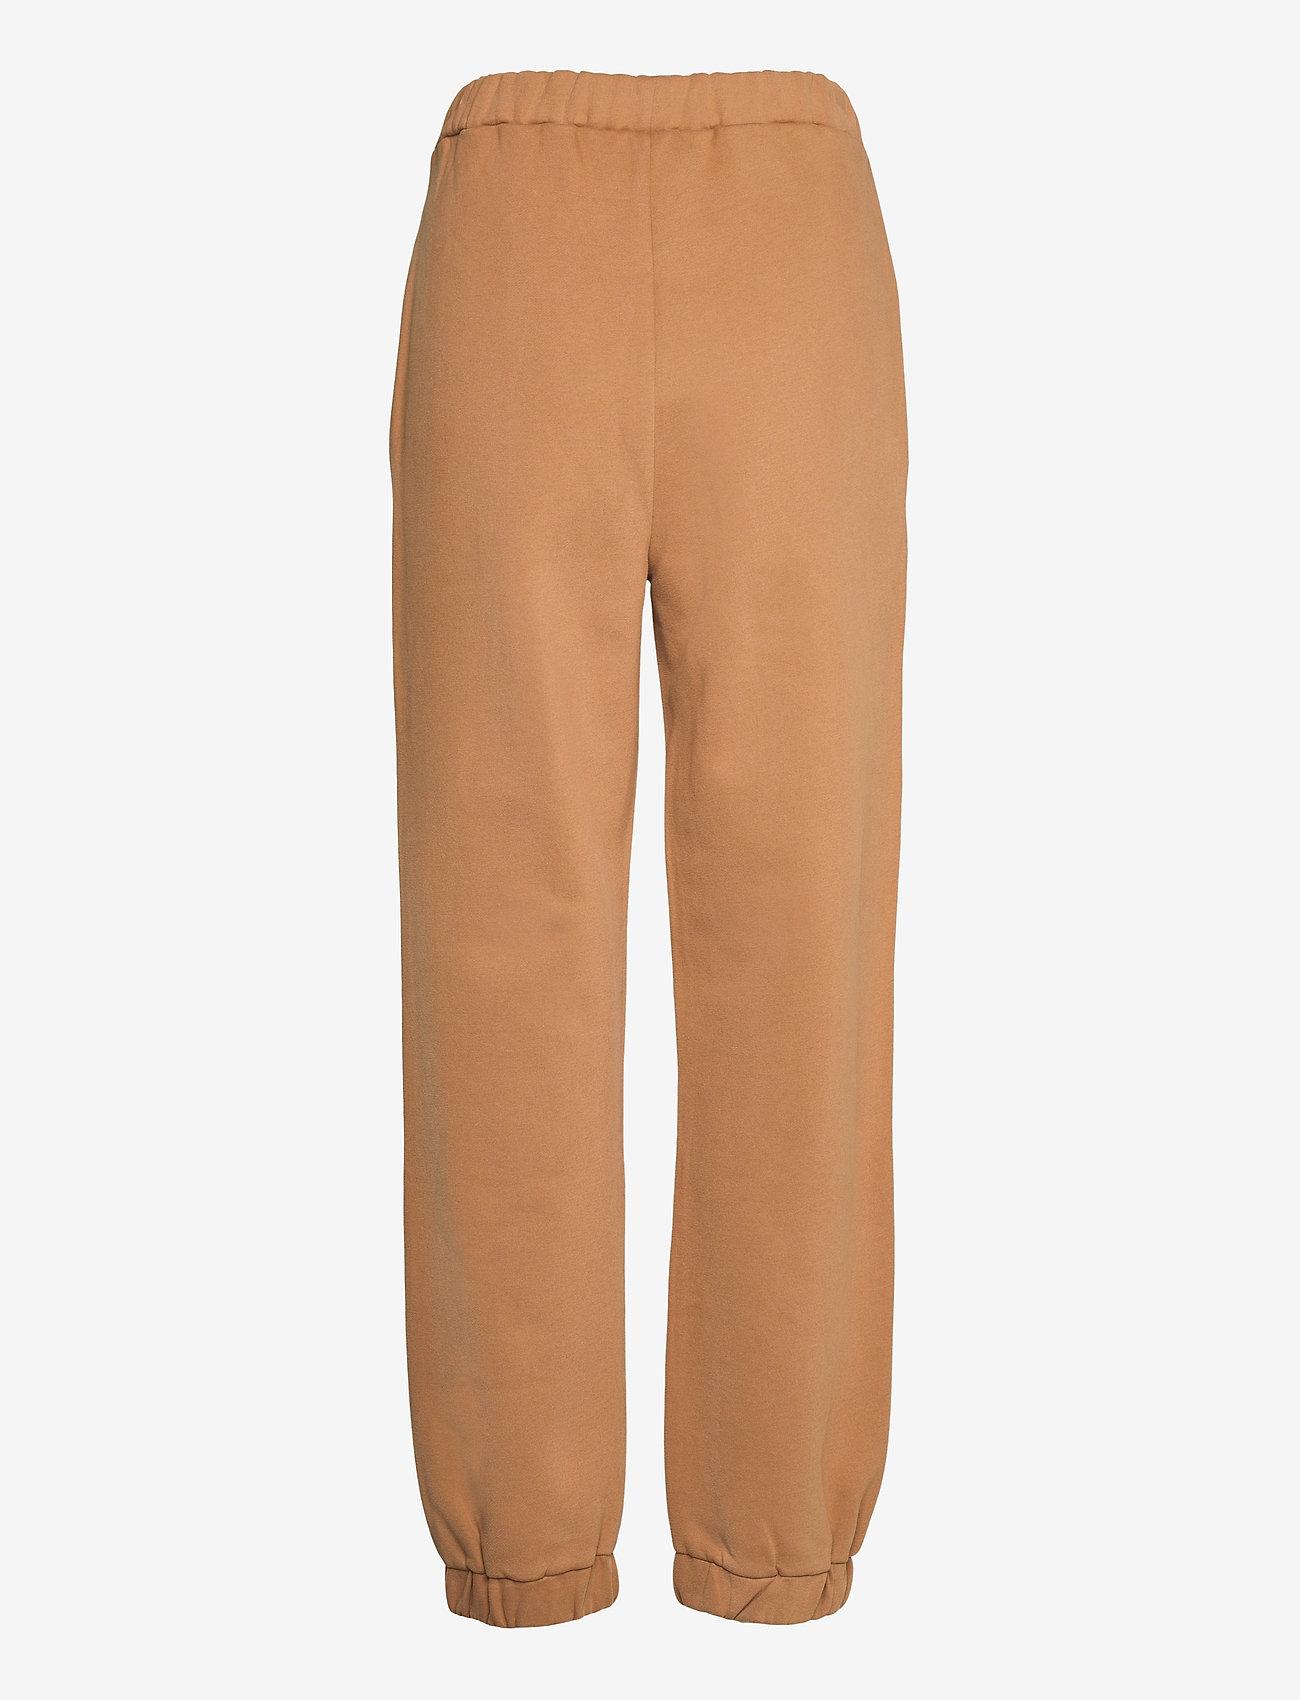 Dagmar - Jam pants - tøj - nougat - 1